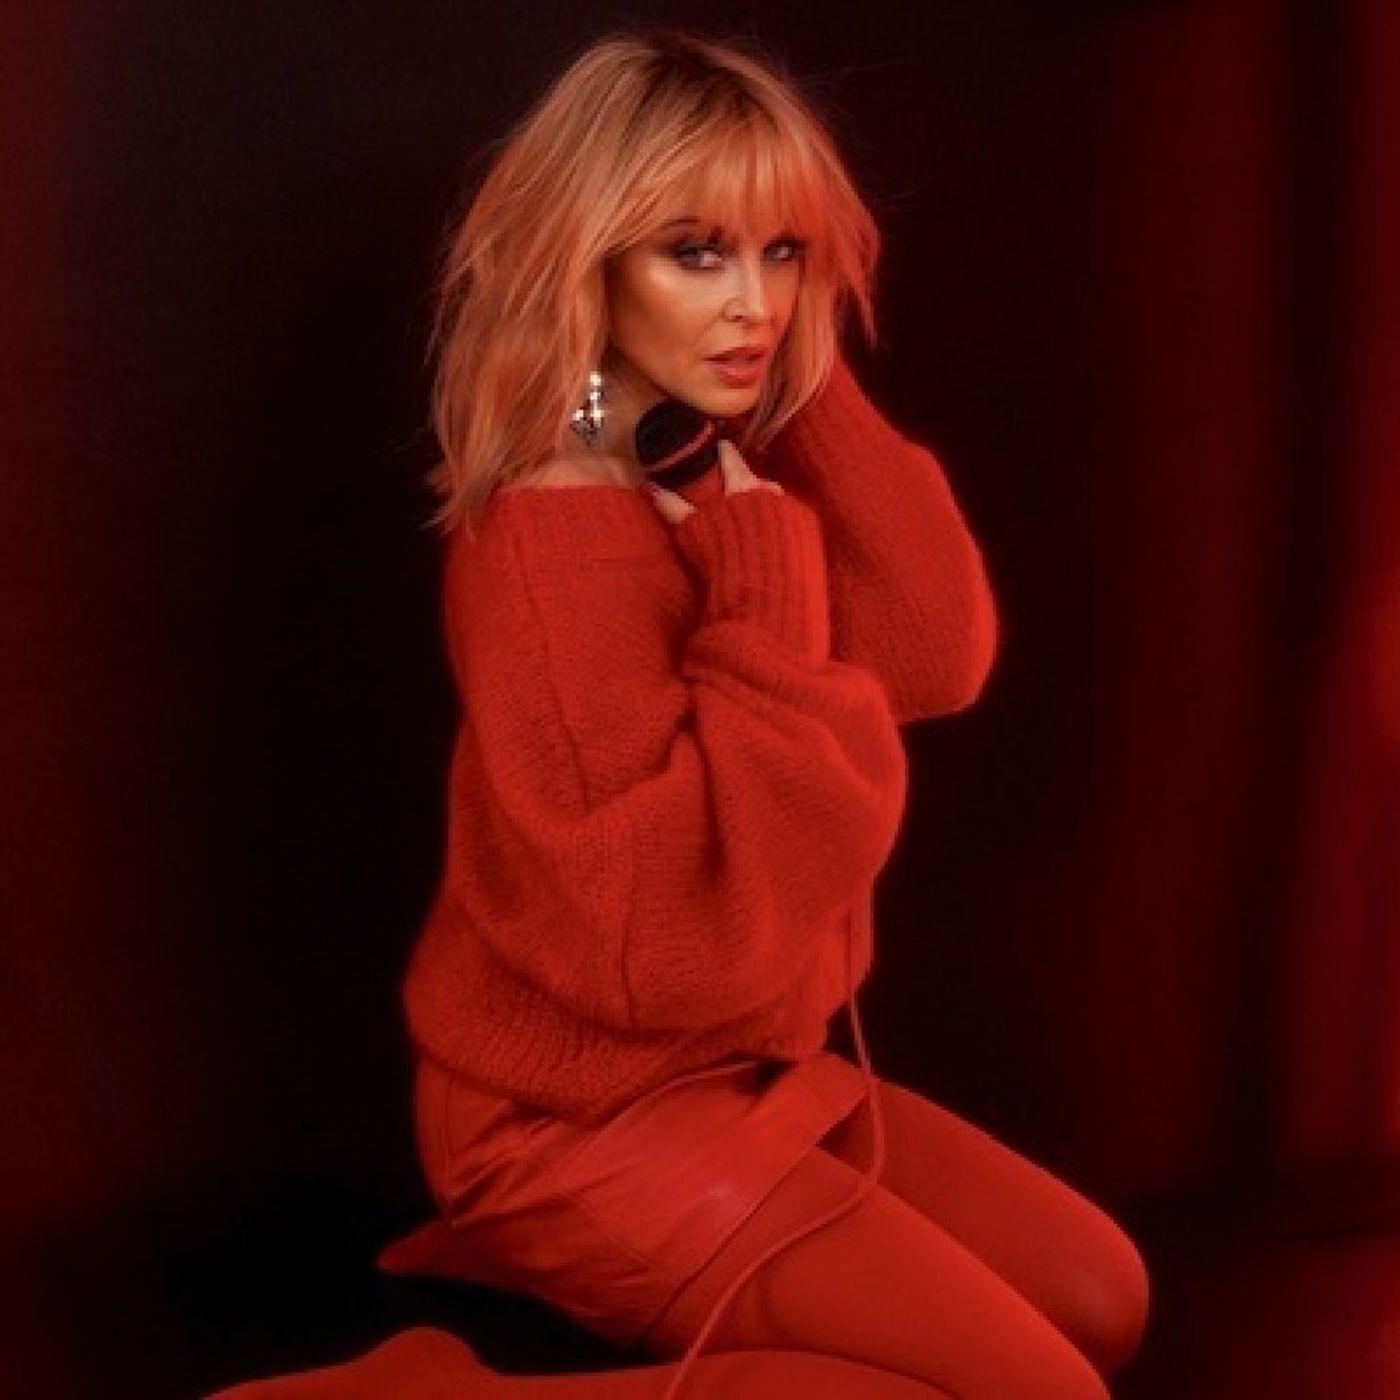 Kylie Minogue Episode 159 - The Danny Diess Show